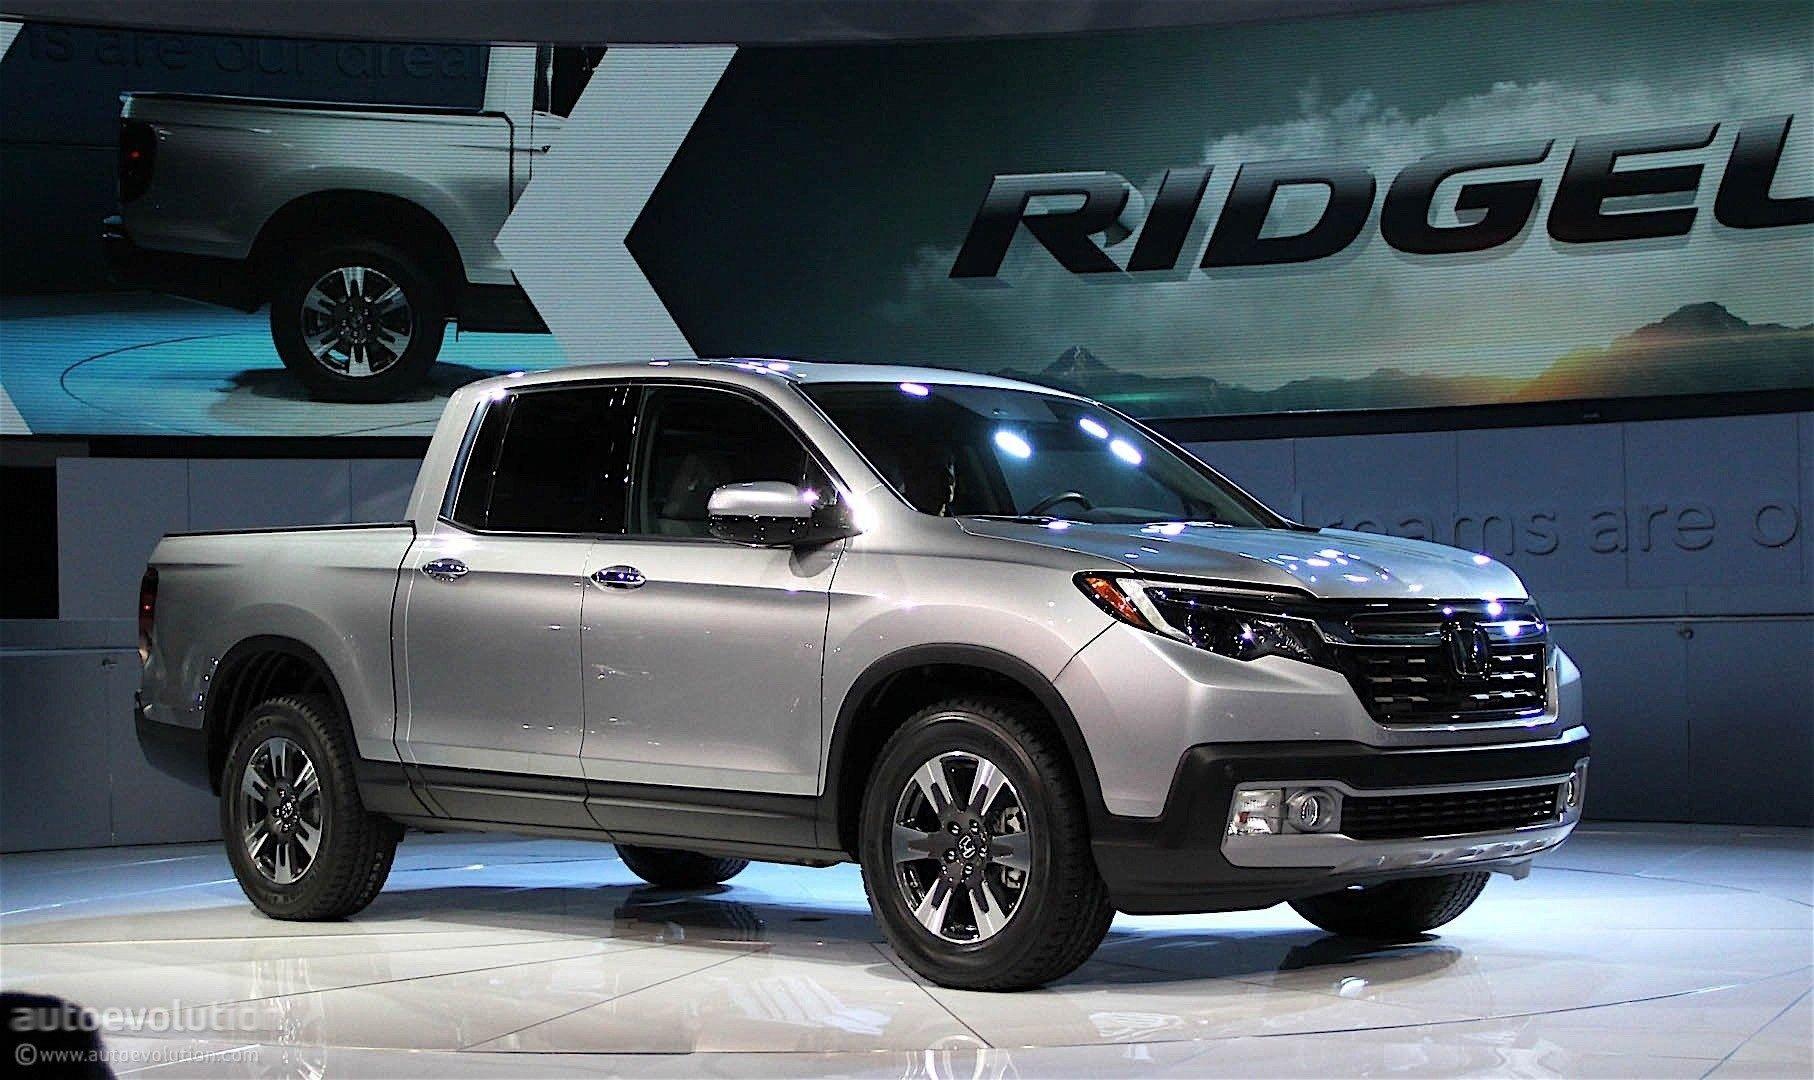 Honda Truck 2020 Images From 2020 Honda Truck Car Design Hd In 2020 Honda Ridgeline Release Date For Honda Truck 2020 Honda Truck Honda Ridgeline Honda